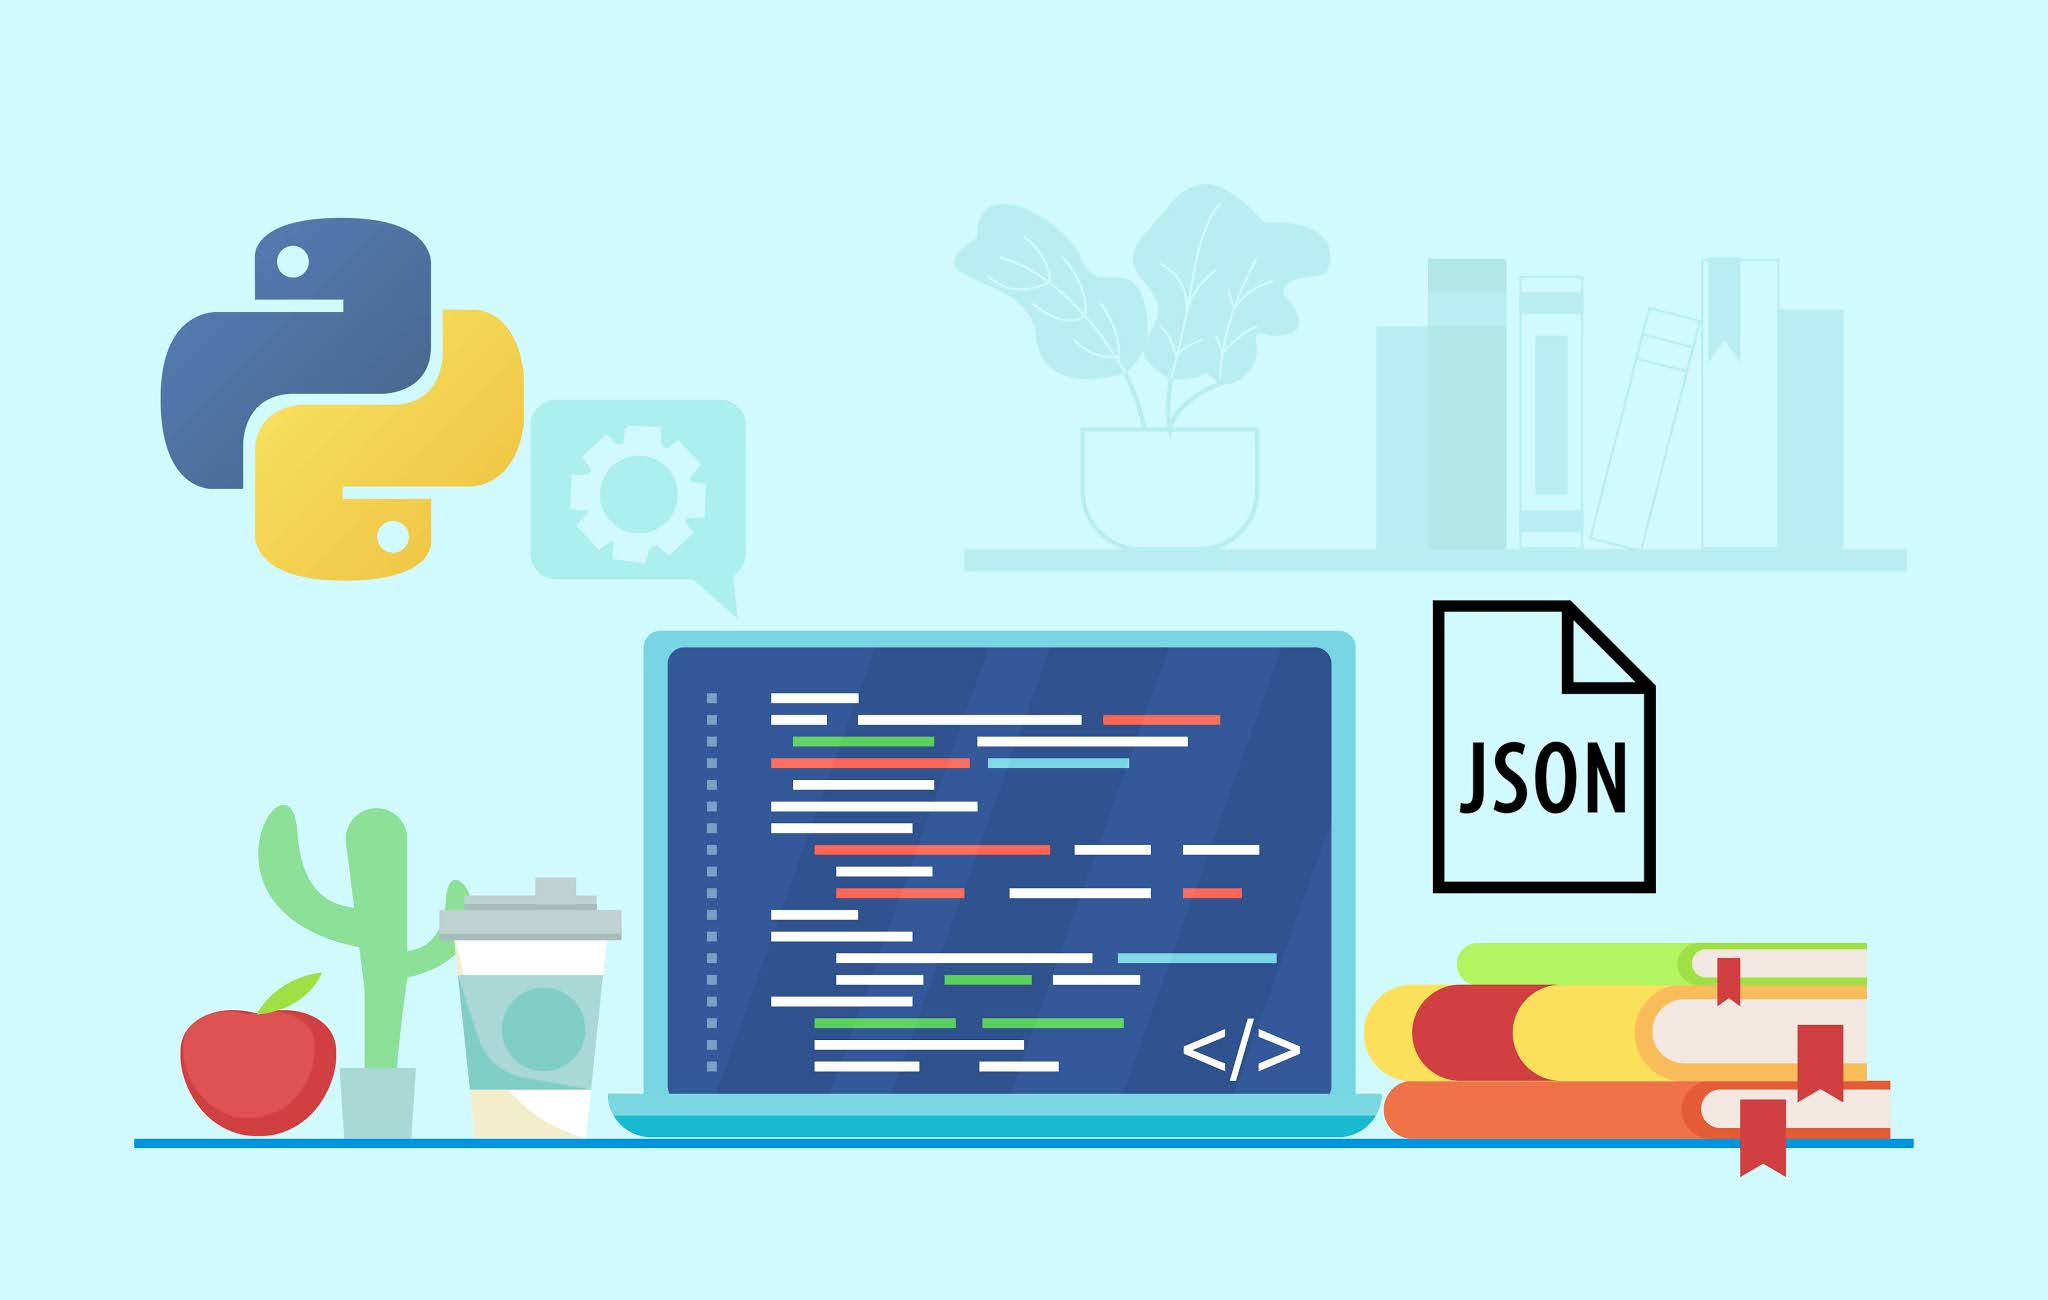 Python - Json Datasıyla Çalışmak